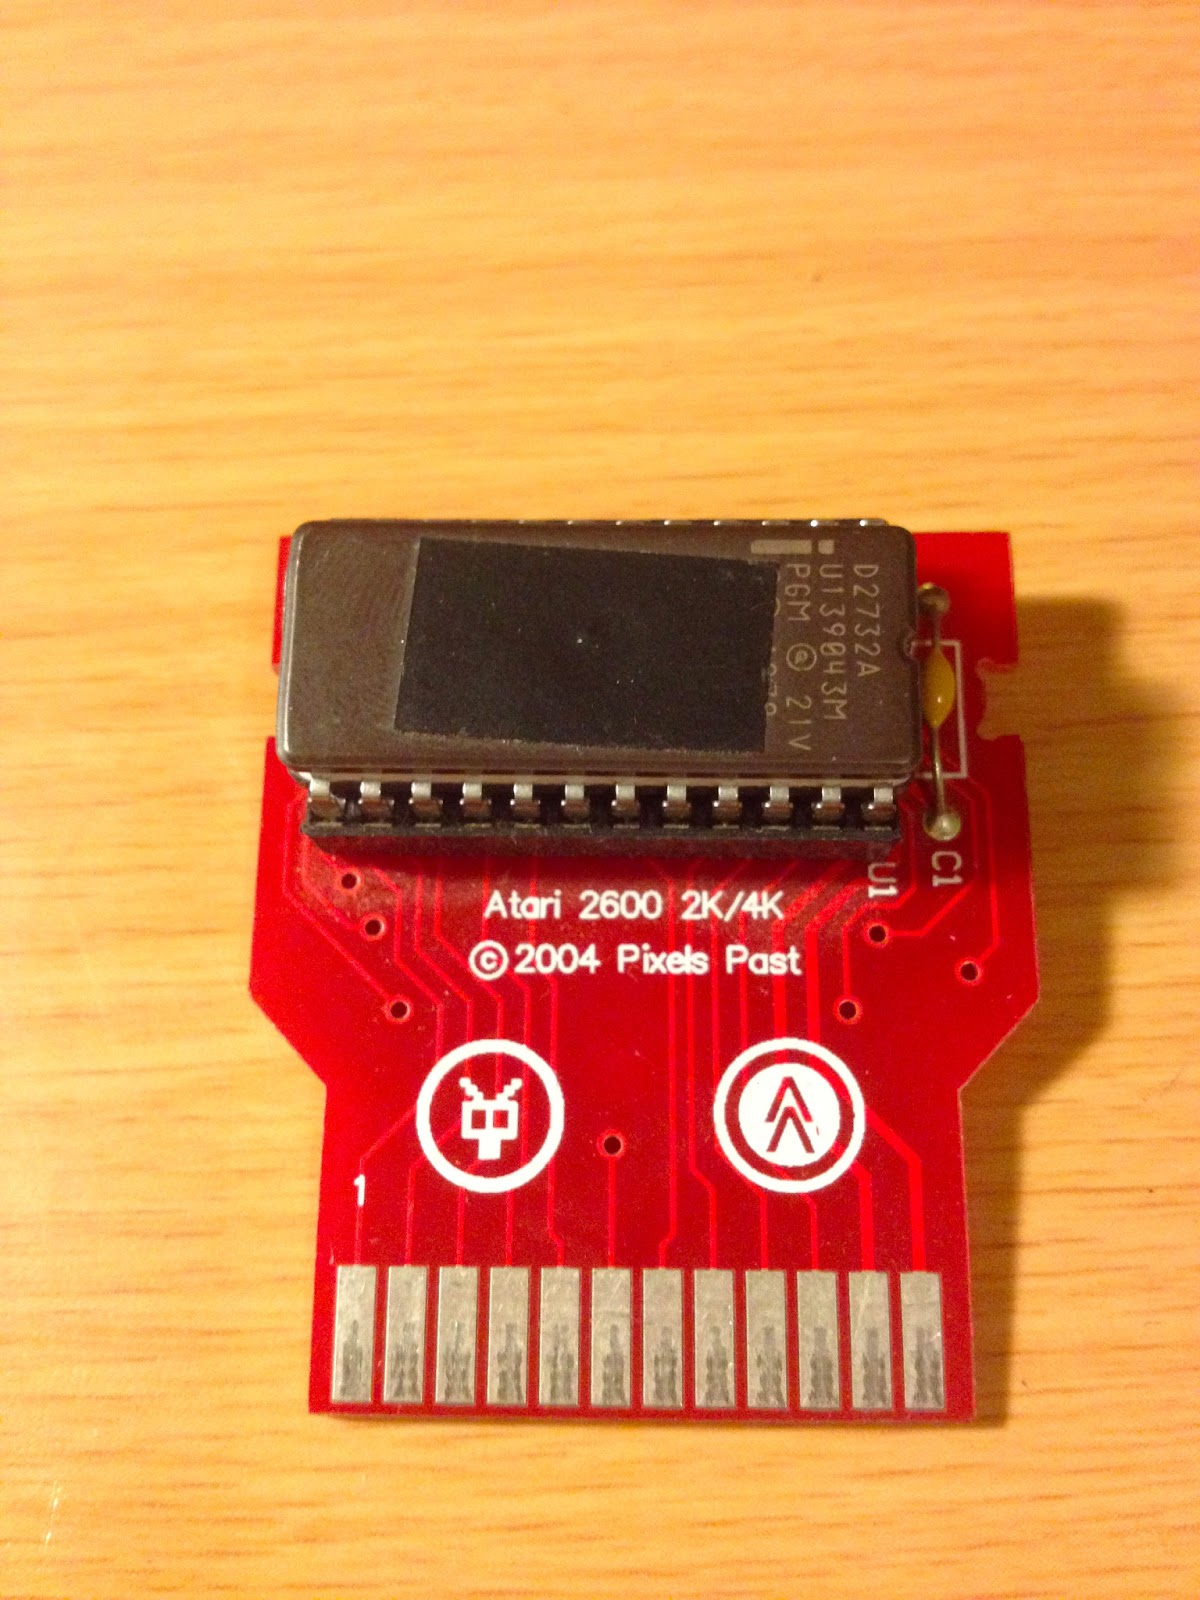 Atari 2600 Vcs Mr Do Scans Dump Download: Little-scale: How To: Make An Atari 2600 MIDI Music Interface